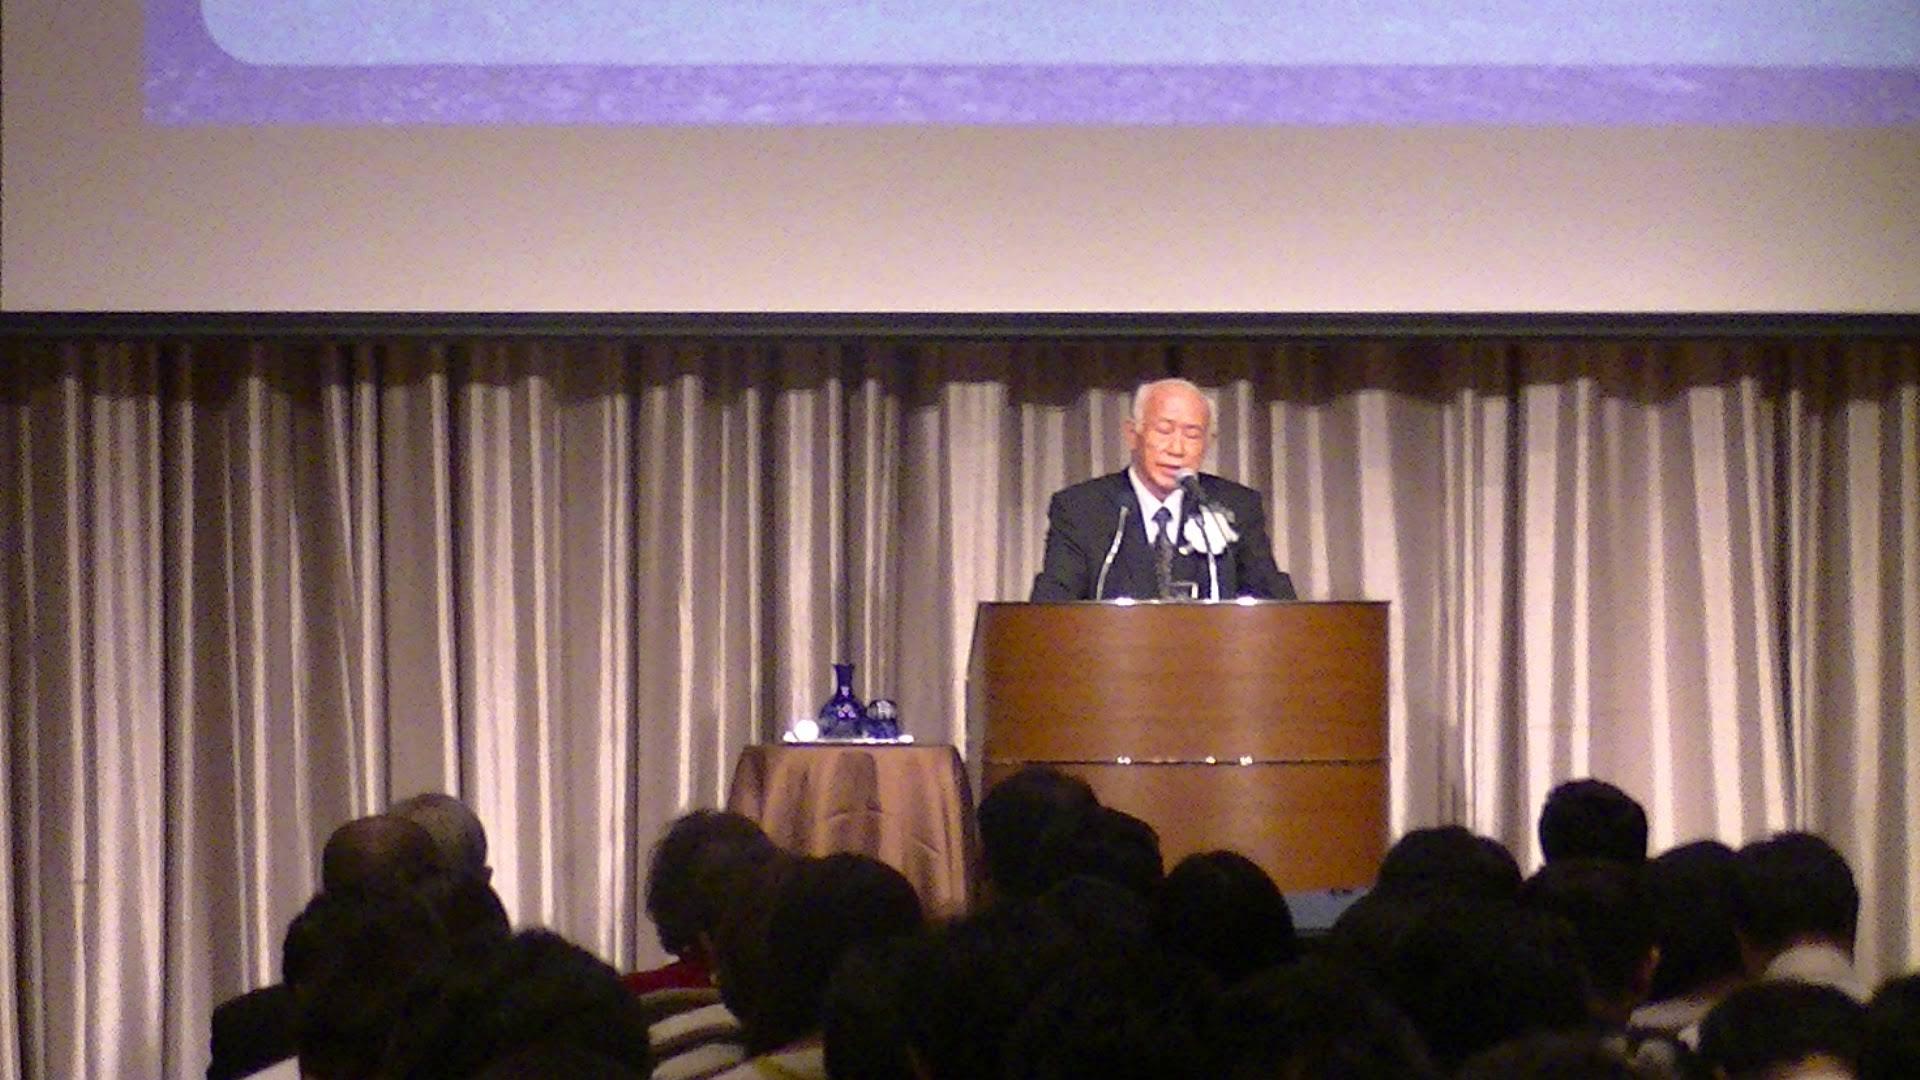 PIC 1653 1 - 思風会全国大会in広島